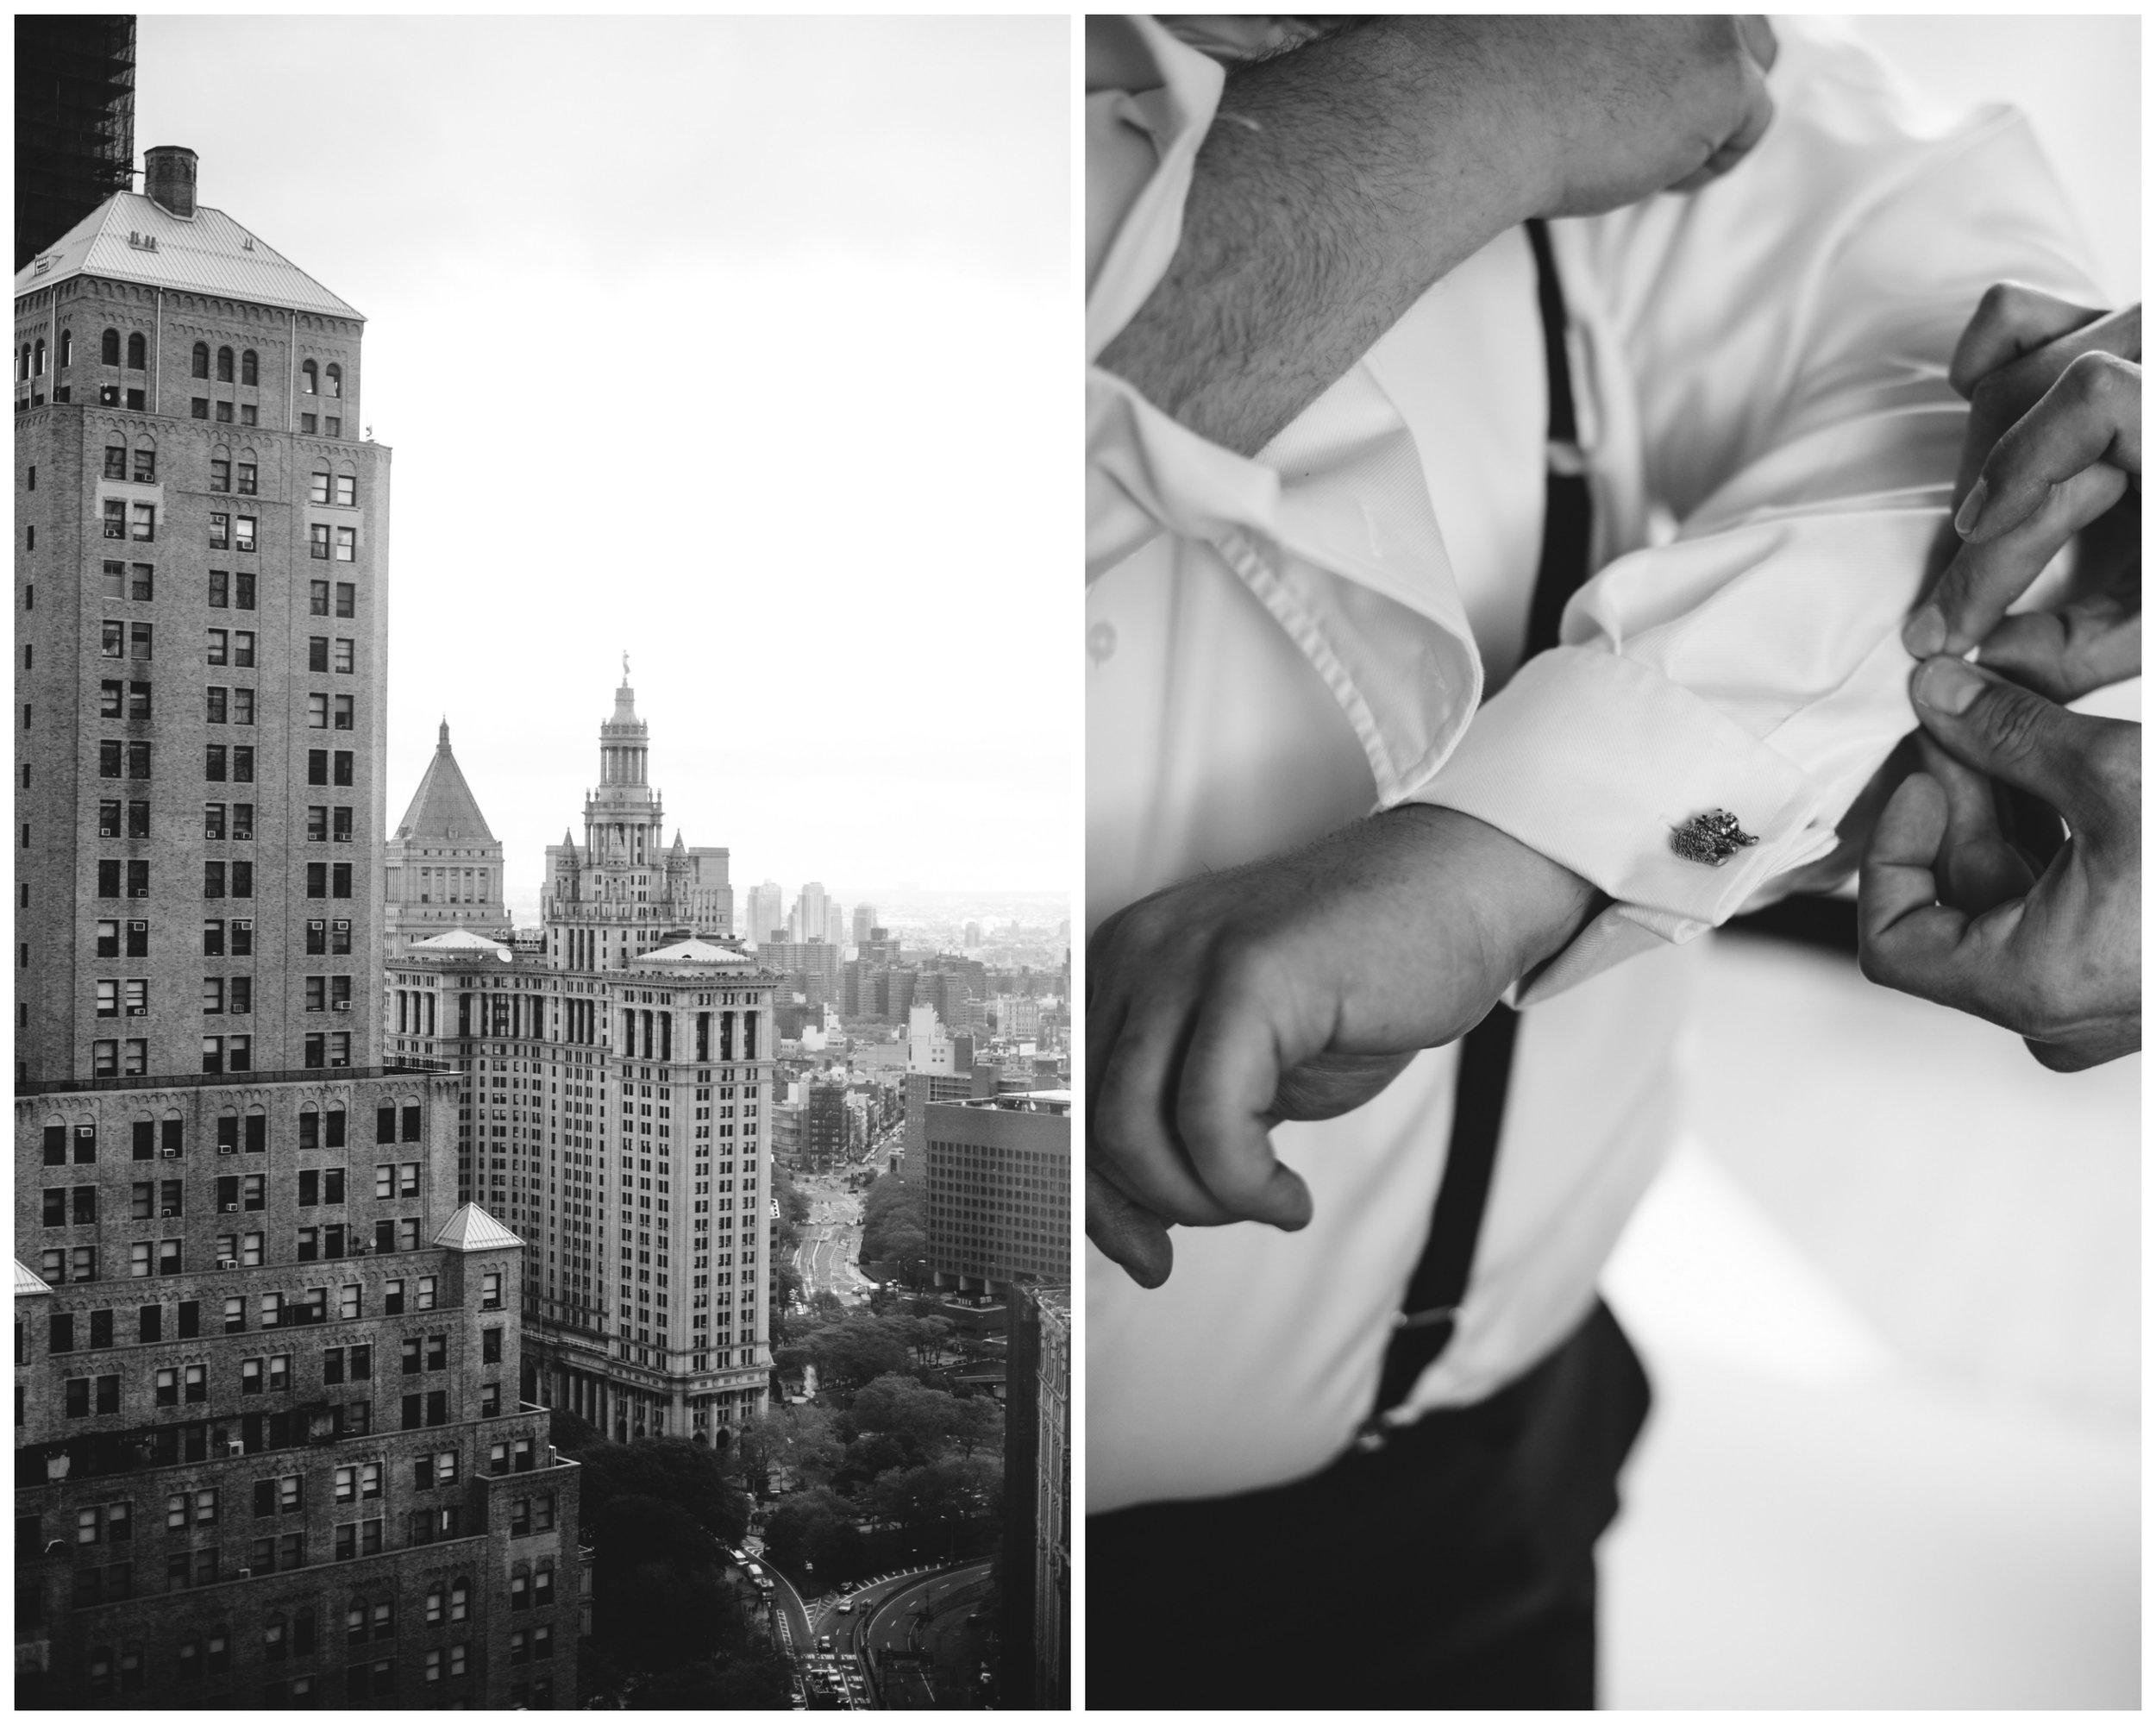 BATTERY PARK GARDENS WEDDING - NYC INTIMATE WEDDING PHOTOGRAPHER - CHI-CHI ARI.jpg